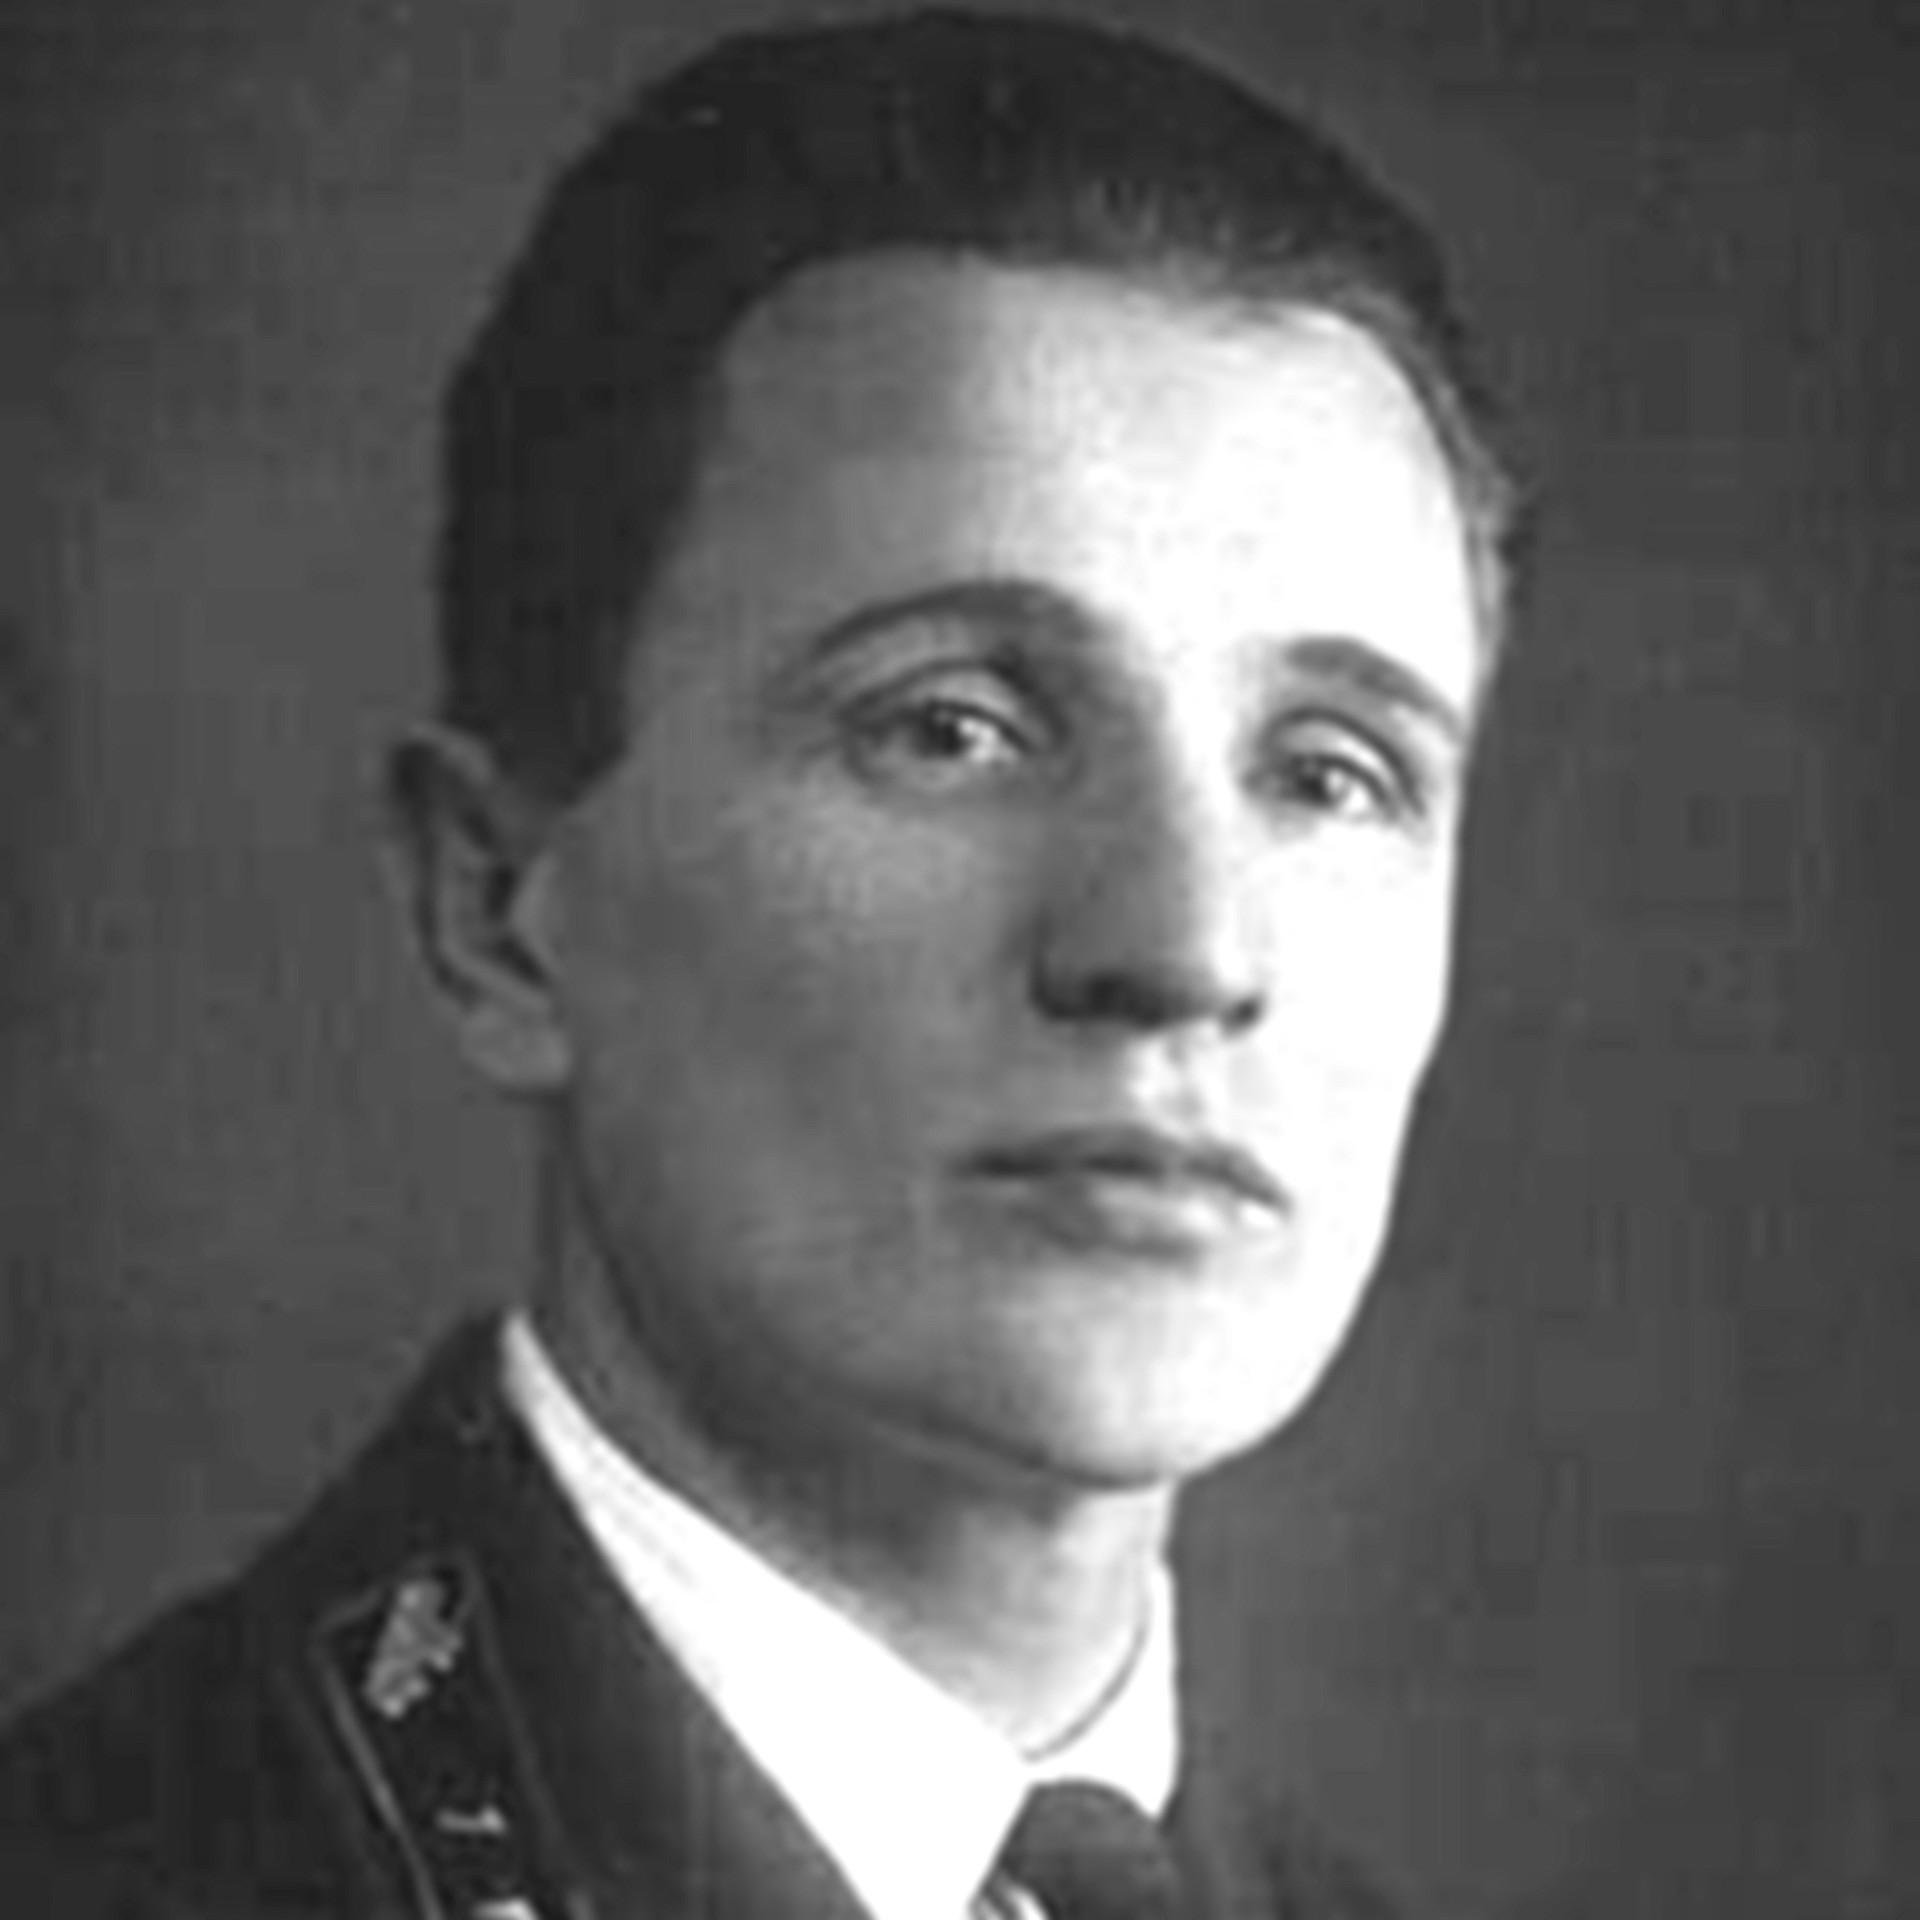 5 Soviet superheroes in World War II who terrified the Nazis - Russia Beyond